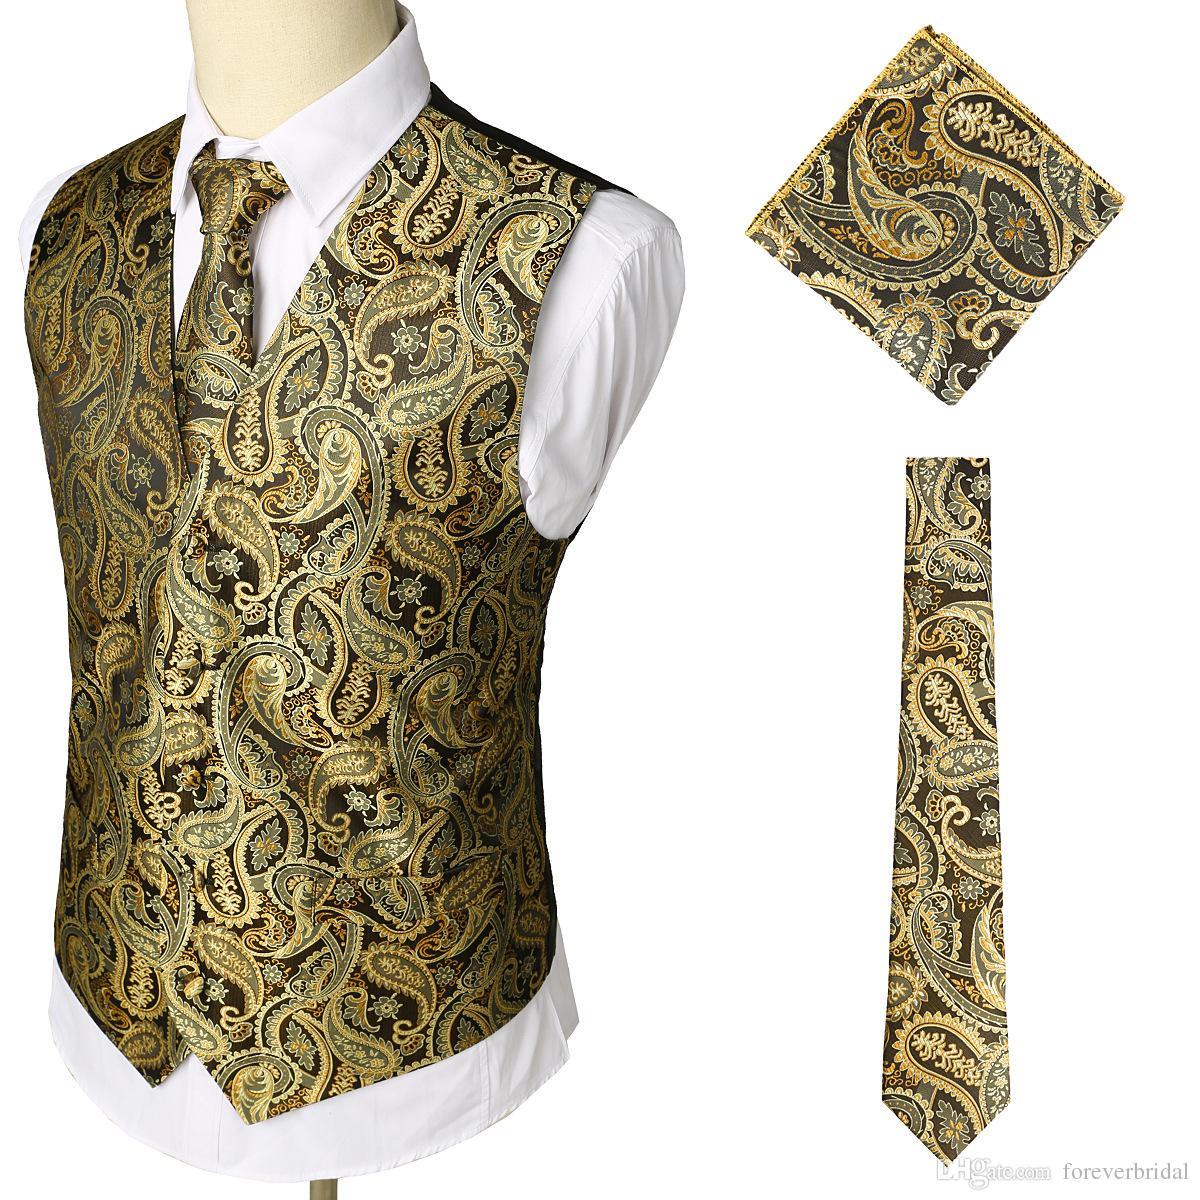 2019 Mens Designer Wedding Vest Slim Fit Floral Pattern Groom Clothes Formal Men Waistcoat Suits In Stock(Vest+Neck Ties+Square Scarf)